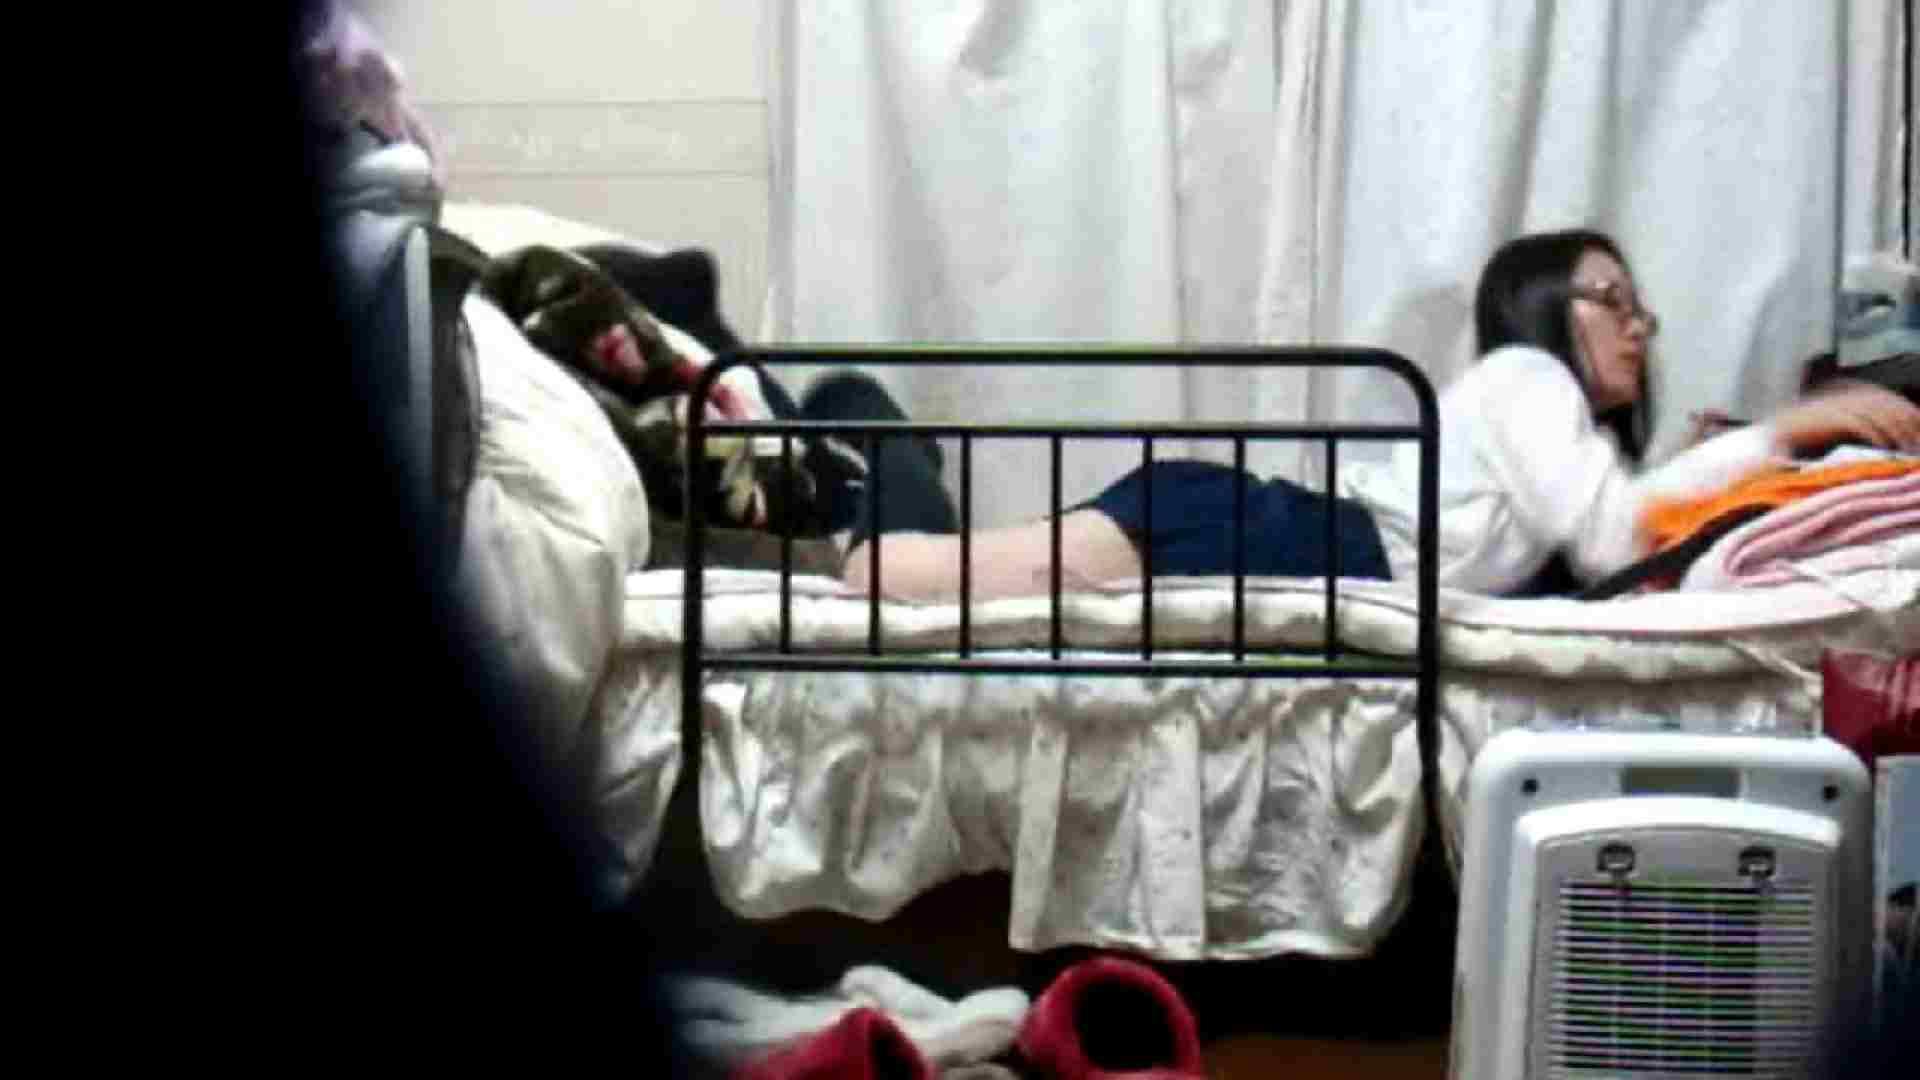 vol.4 まどかの帰宅後の部屋、ベッドで何かが始まります。 ○族 ヌード画像 100画像 39